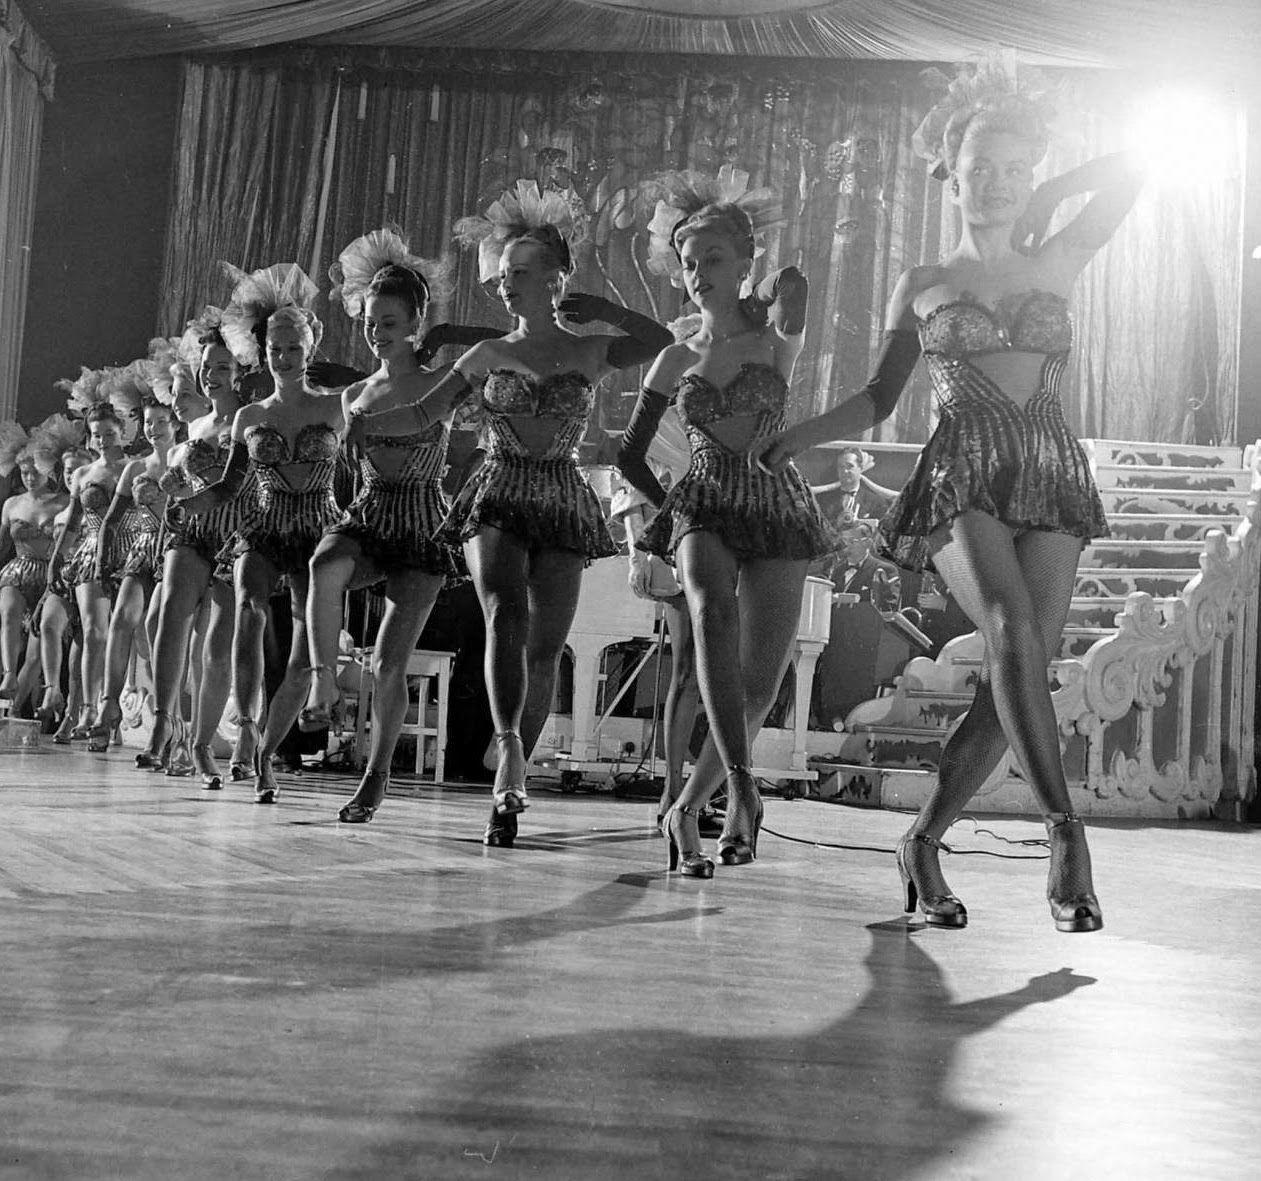 Chorus+Girls+at+the+Latin+Quarter,+New+York,+1949+(2).jpg